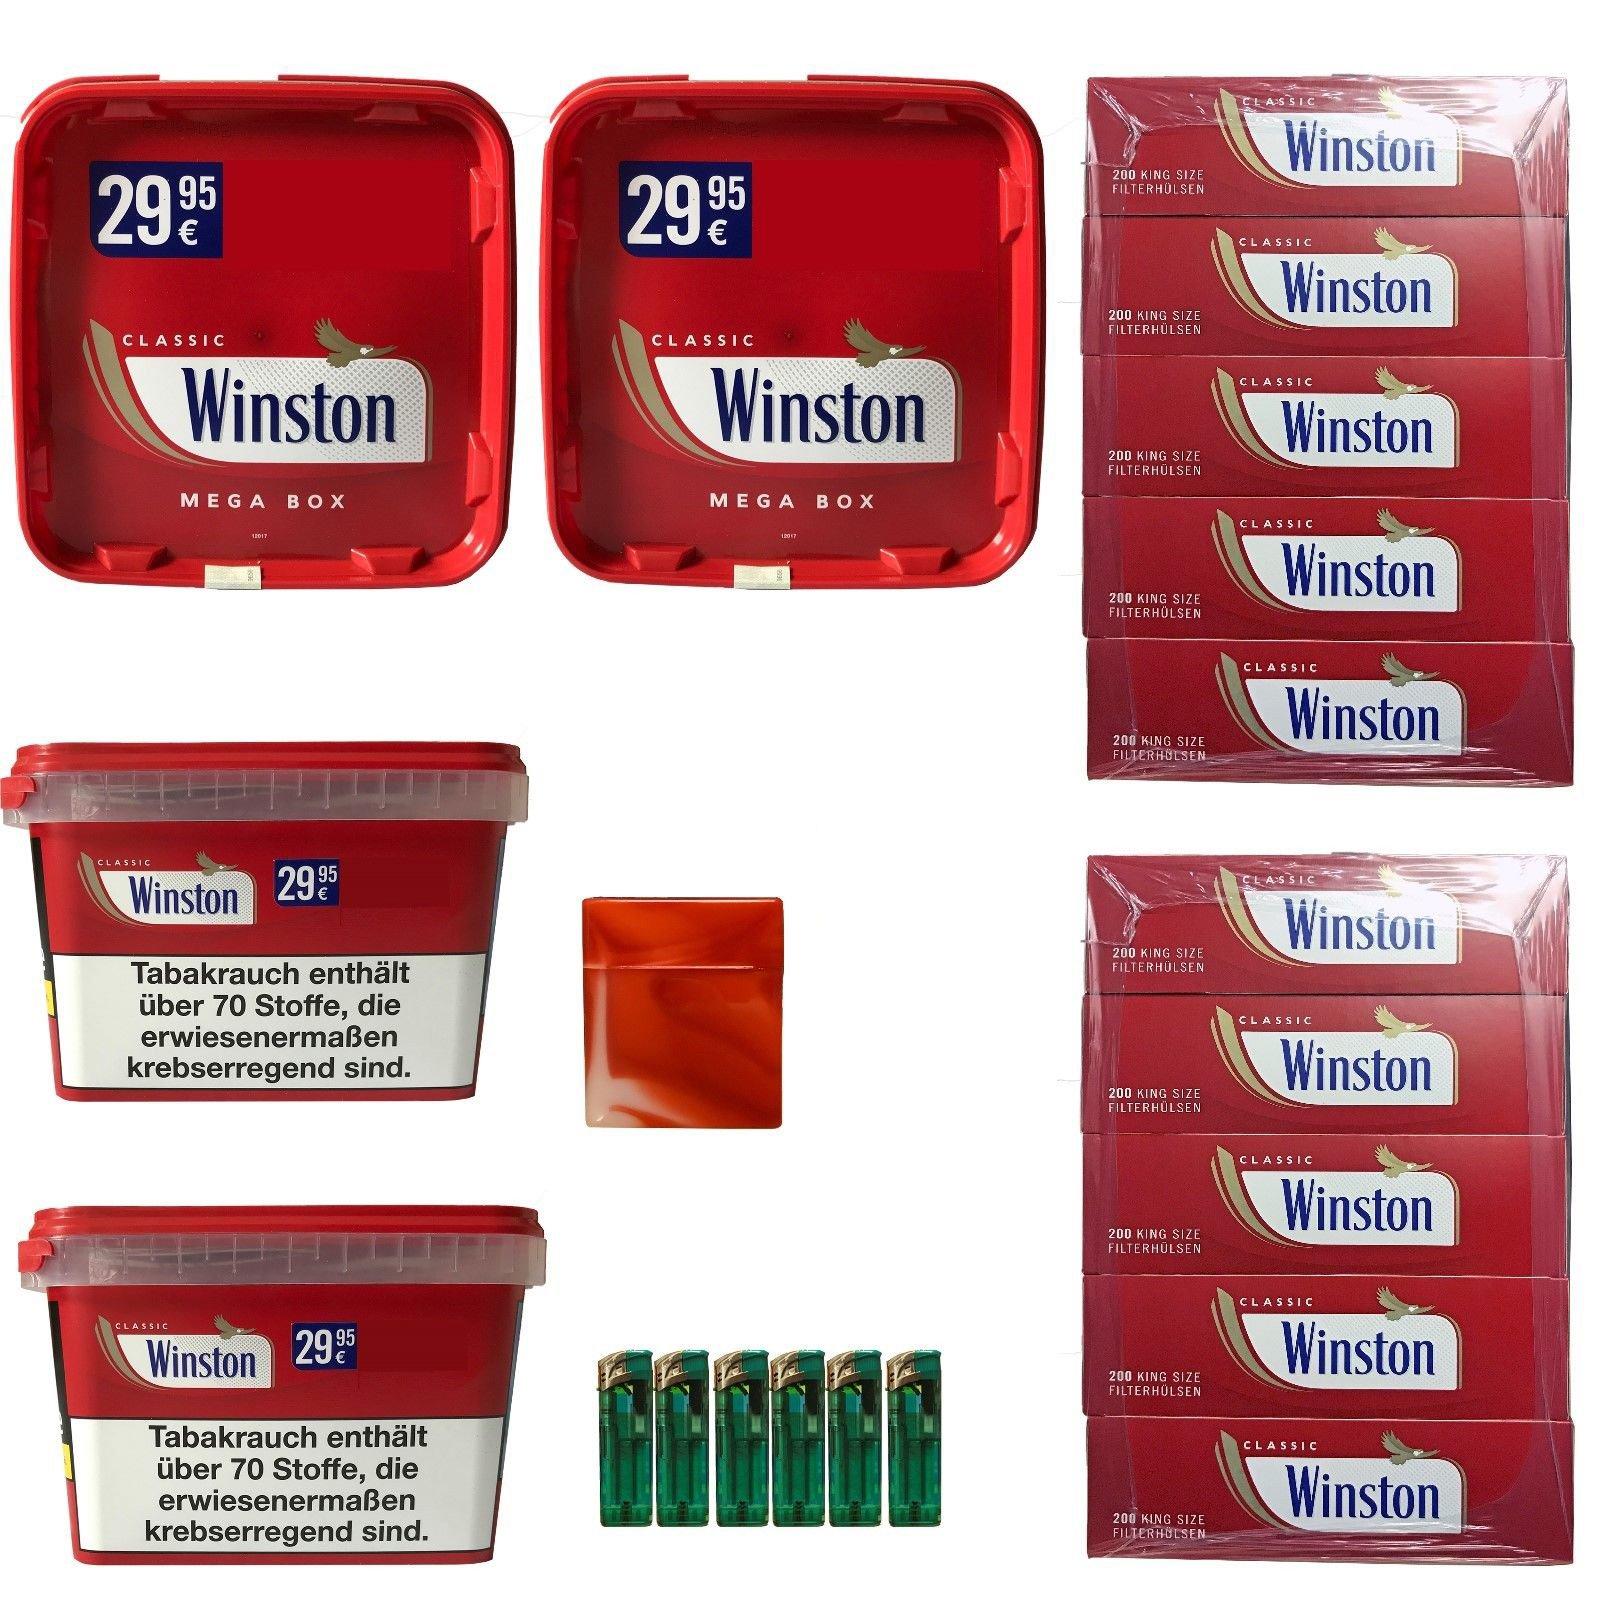 4 x Winston Tabak Mega Boxes 185g, Winston Hülsen, Feuerzeuge